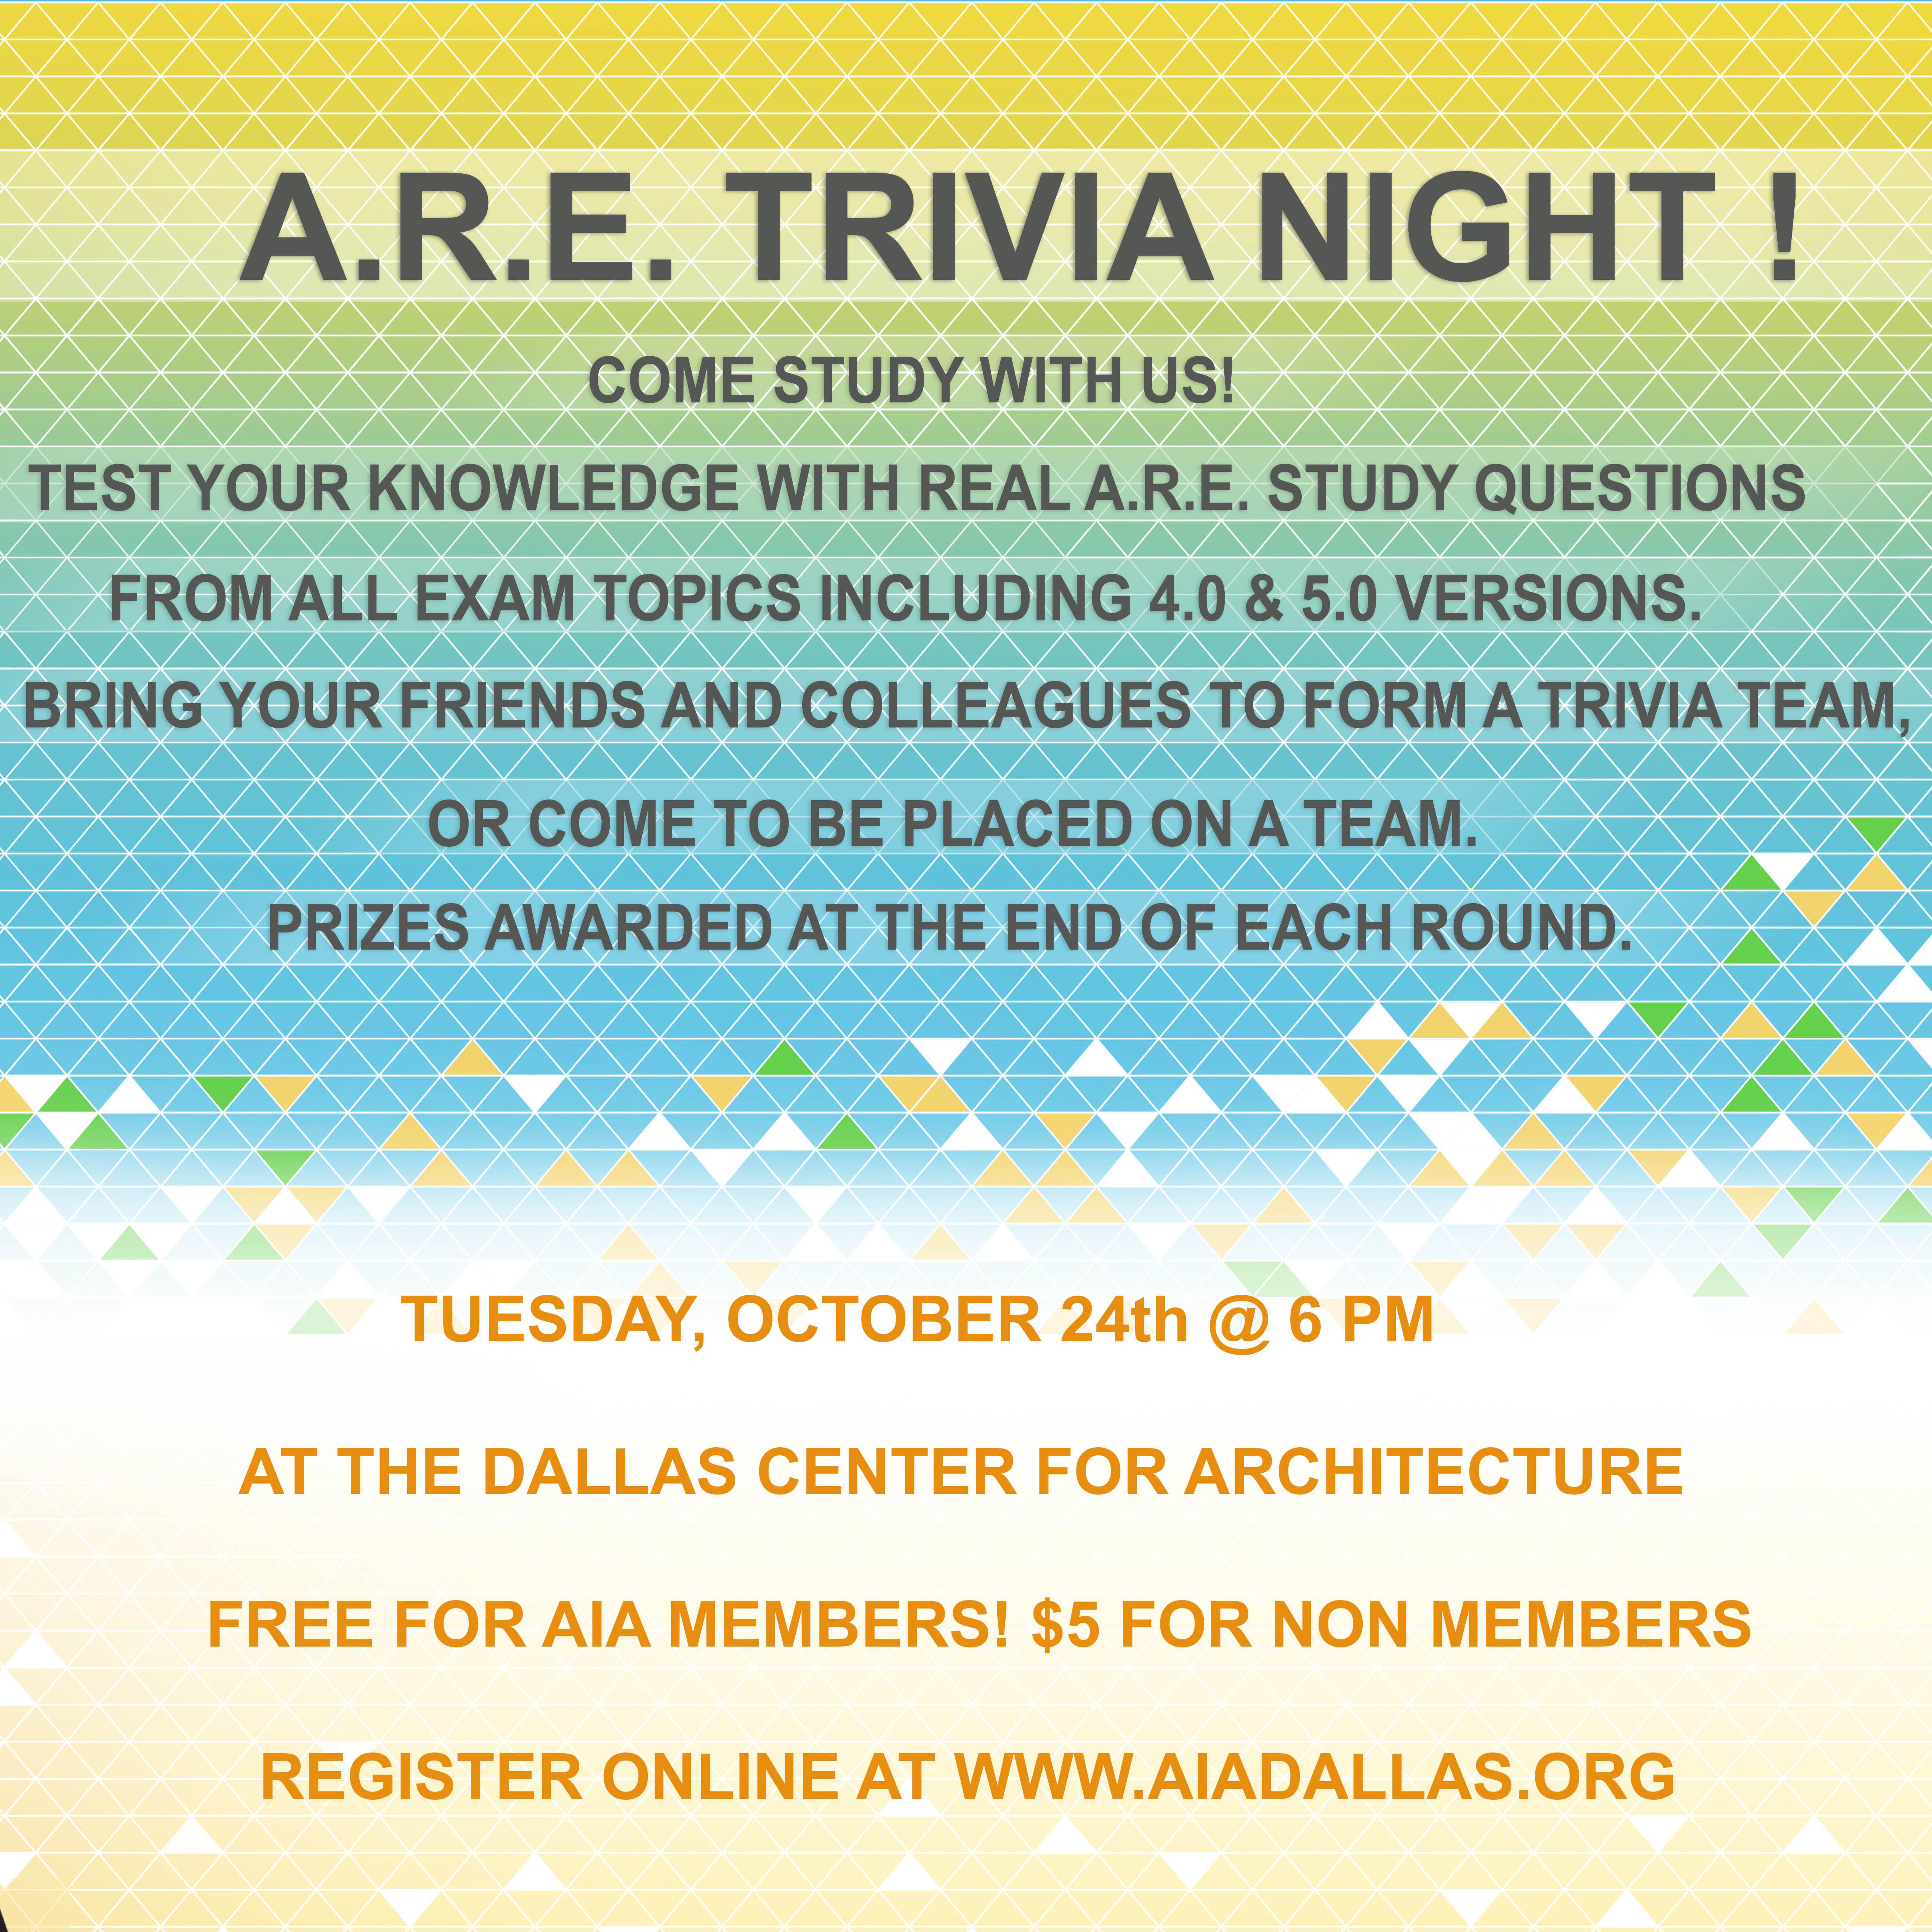 A.R.E. Trivia Night!